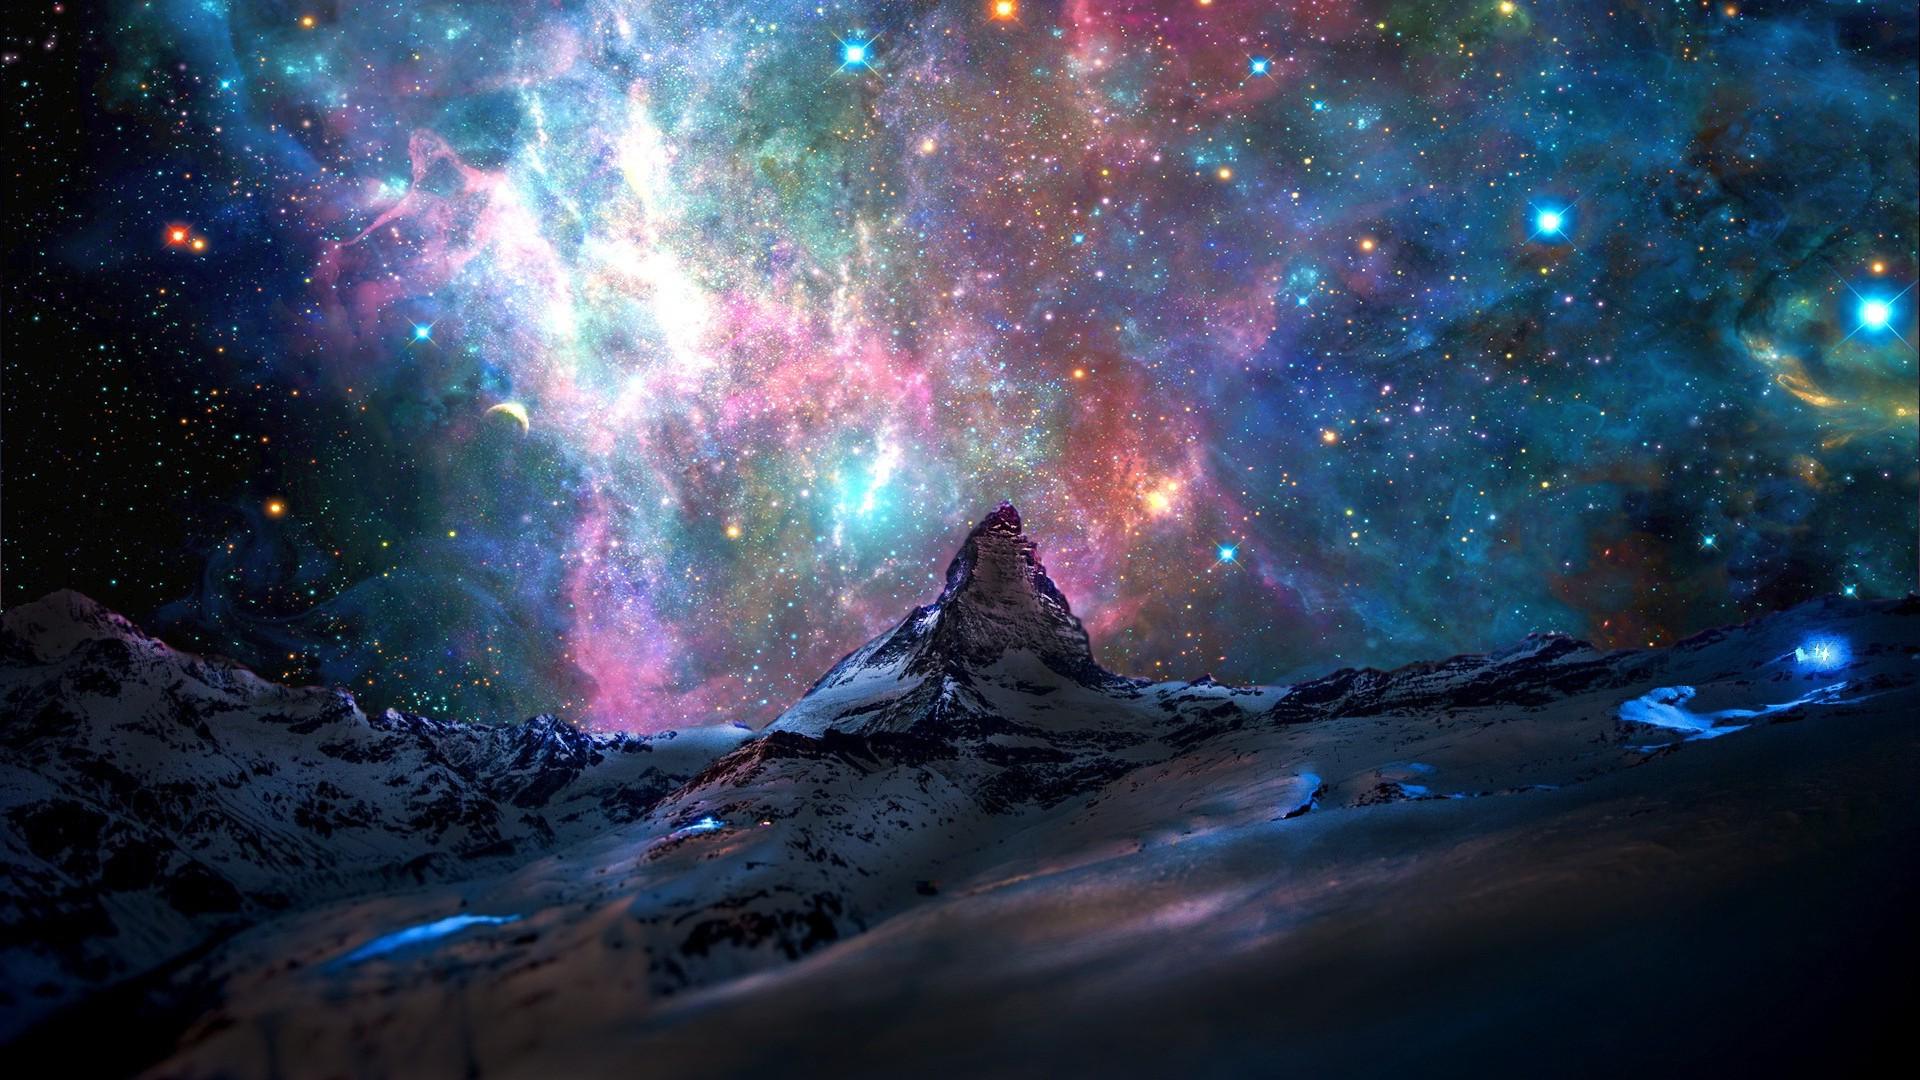 Space Stars HD Desktop Wallpaper